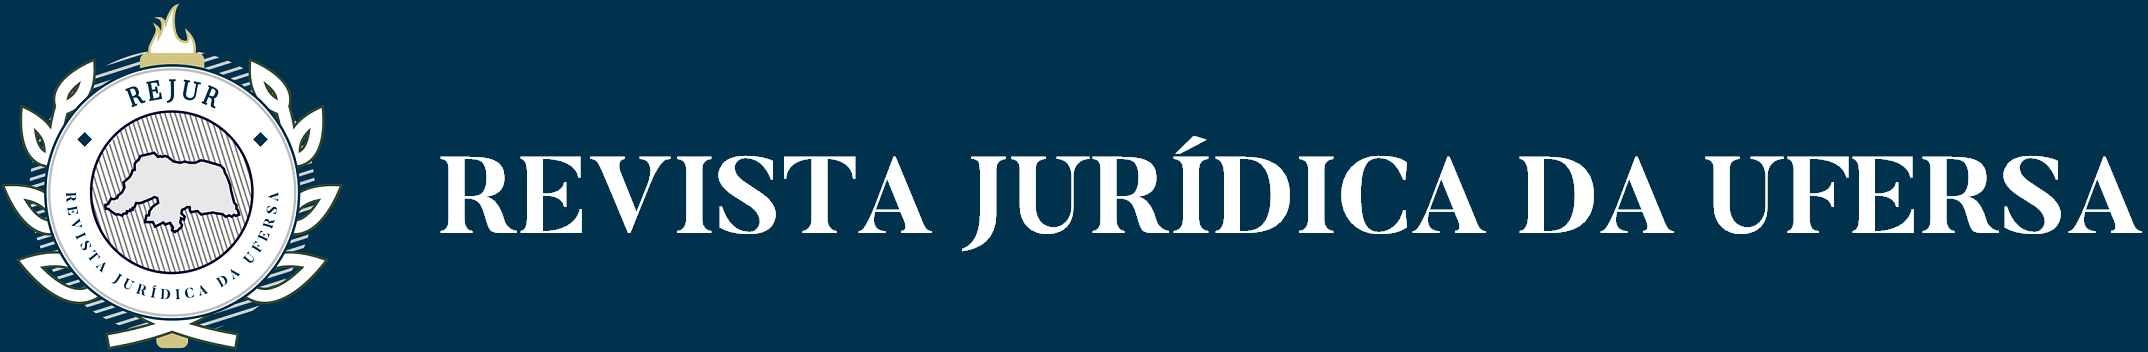 Revista Jurídica da UFERSA